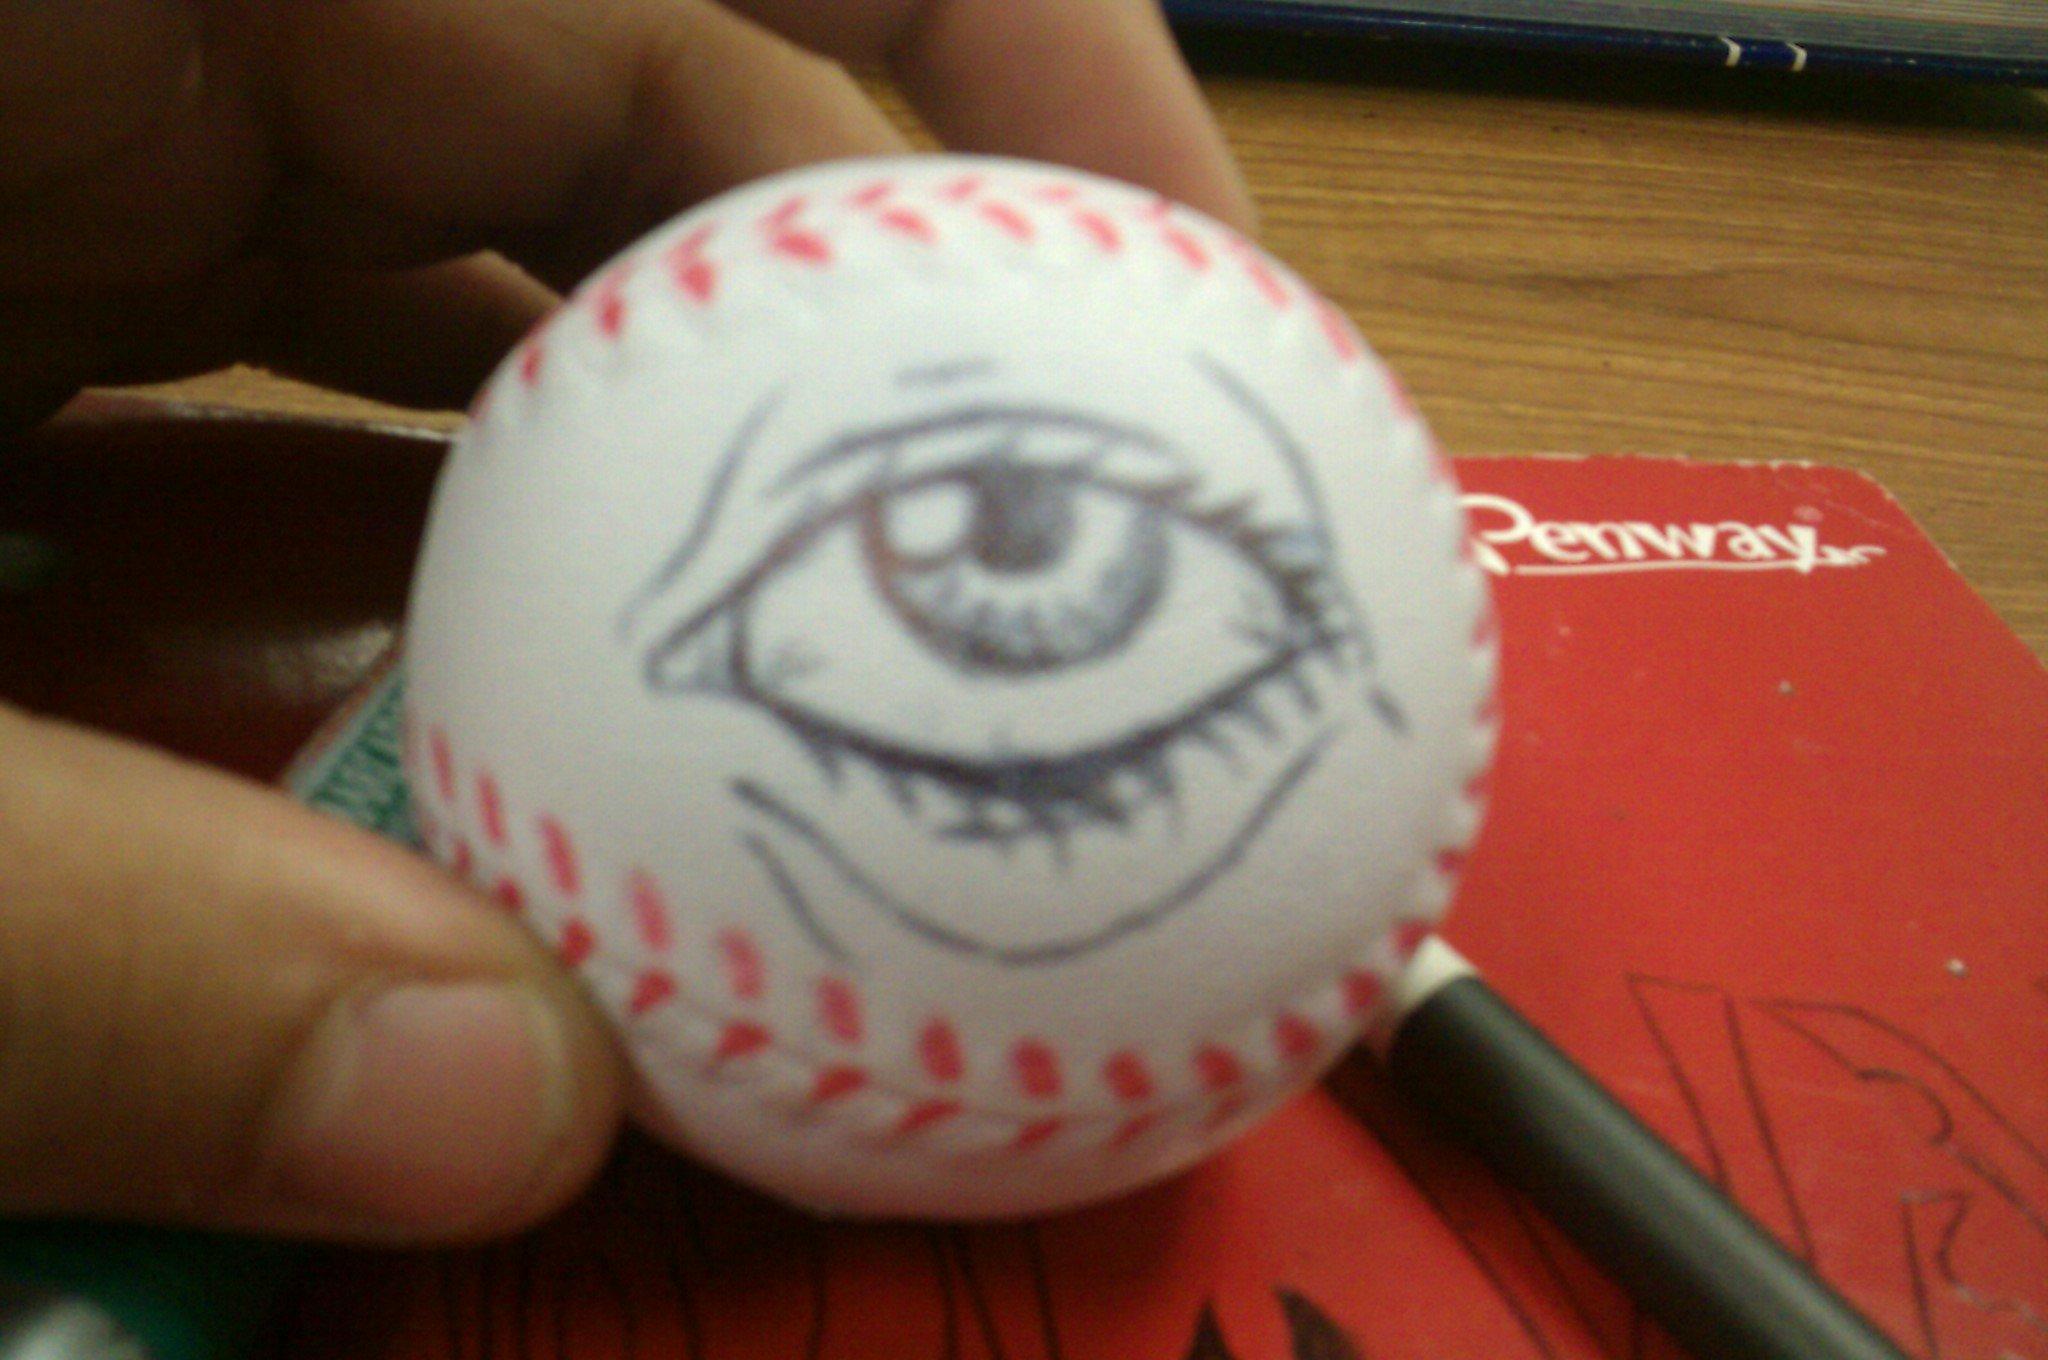 keep your eye on the ball